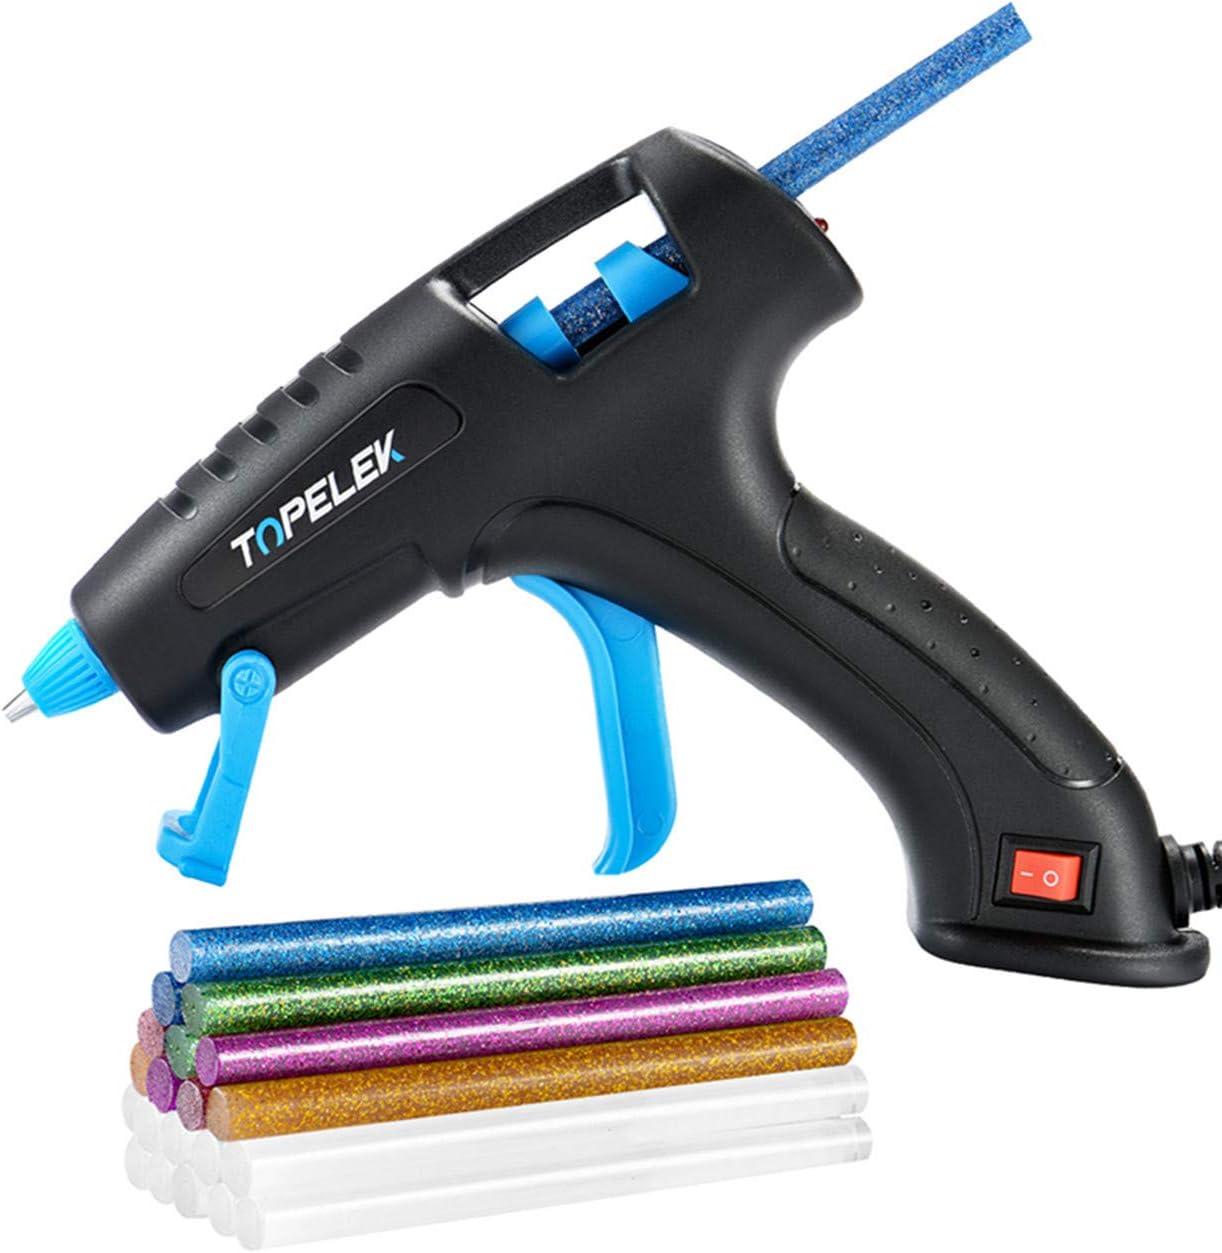 TOPELEK Hot Glue Gun, 30W Glue Gun Kit with Longer Handle, 3 Finger Protectors, 20pcs Glue Sticks, Melting Gun for Small DIY Projects, Arts & Crafts, Home Quick Repairs, Black: Home & Kitchen